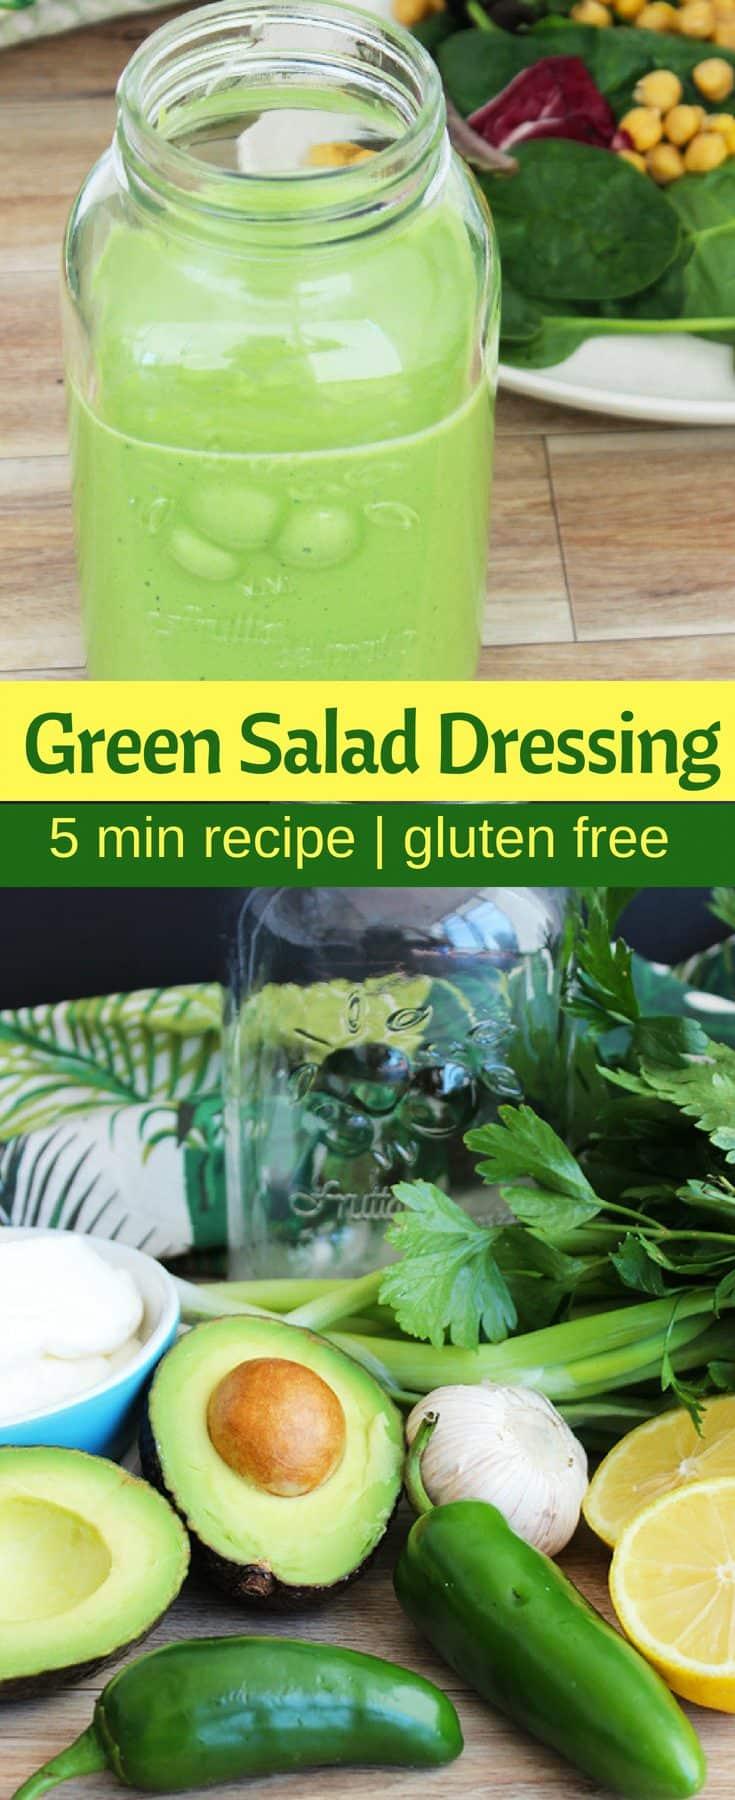 Green salad dressing pinterest collage